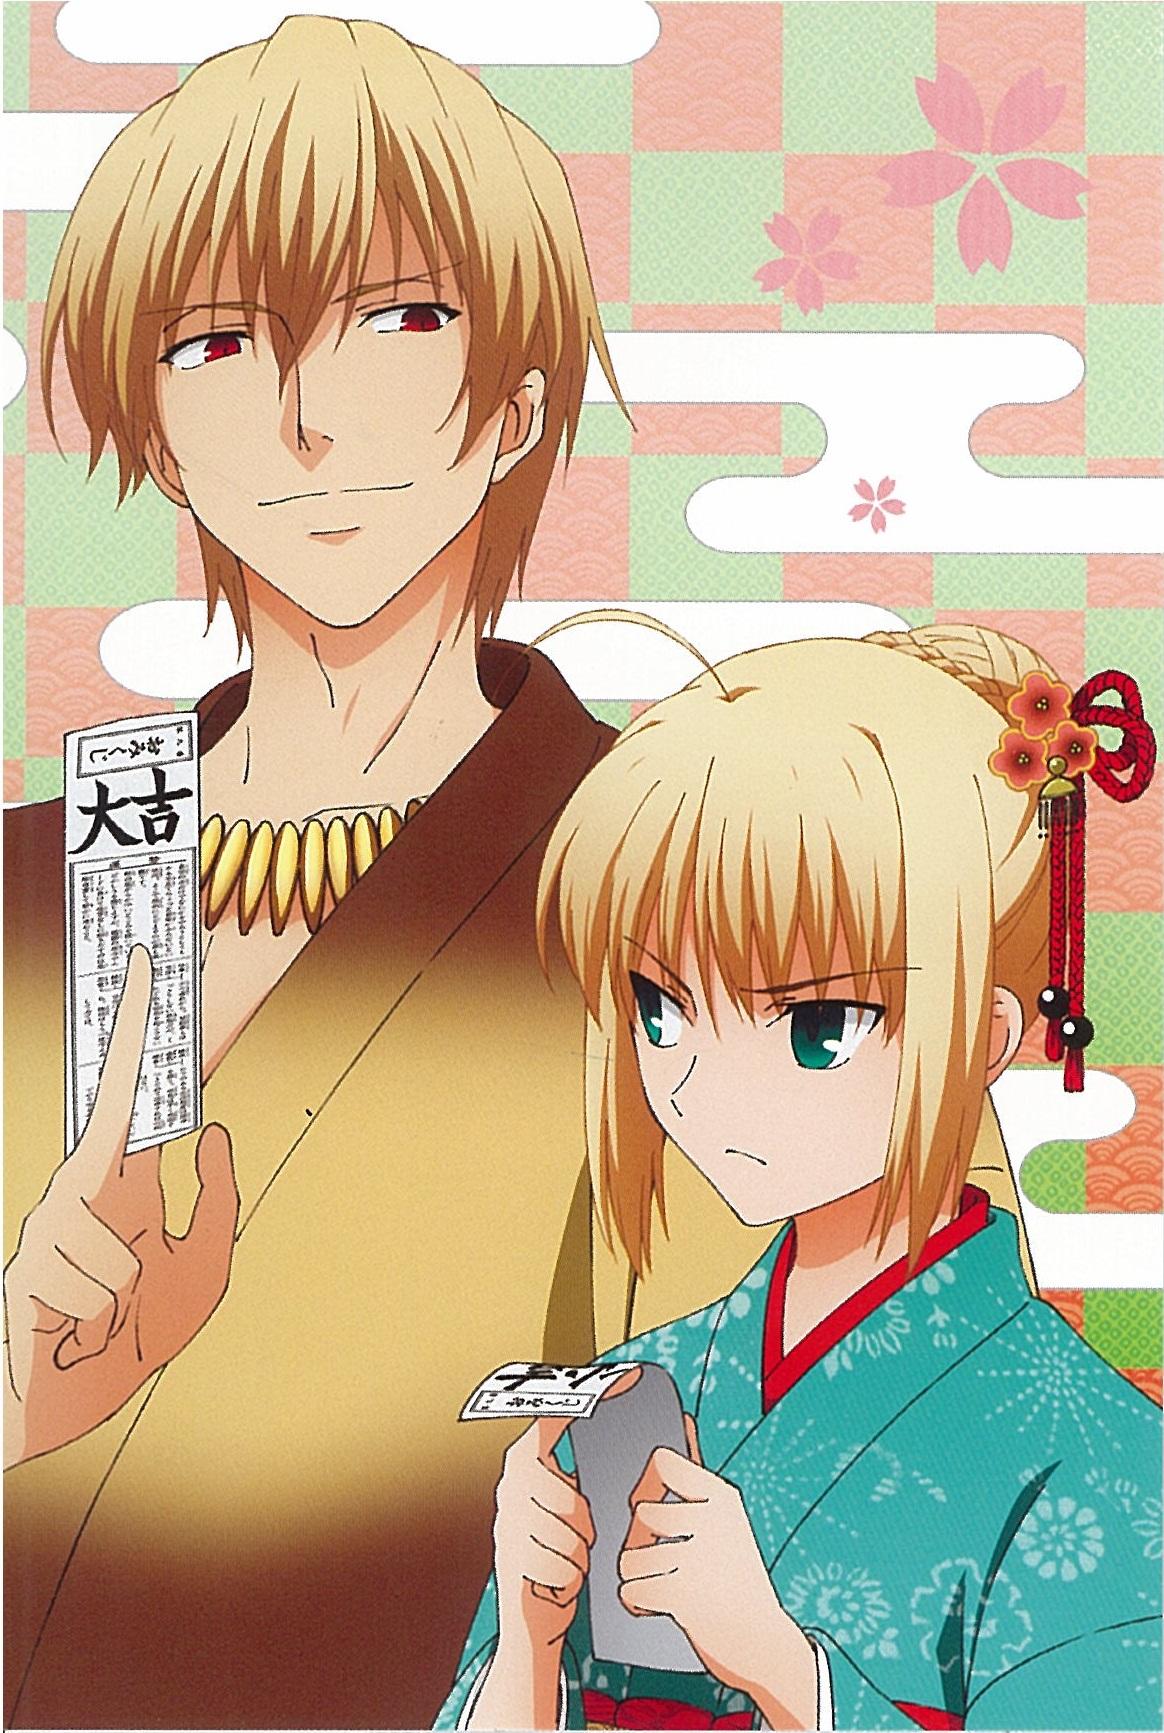 Dec 2017 Full Moon >> Fate/zero Mobile Wallpaper #1384903 - Zerochan Anime Image Board